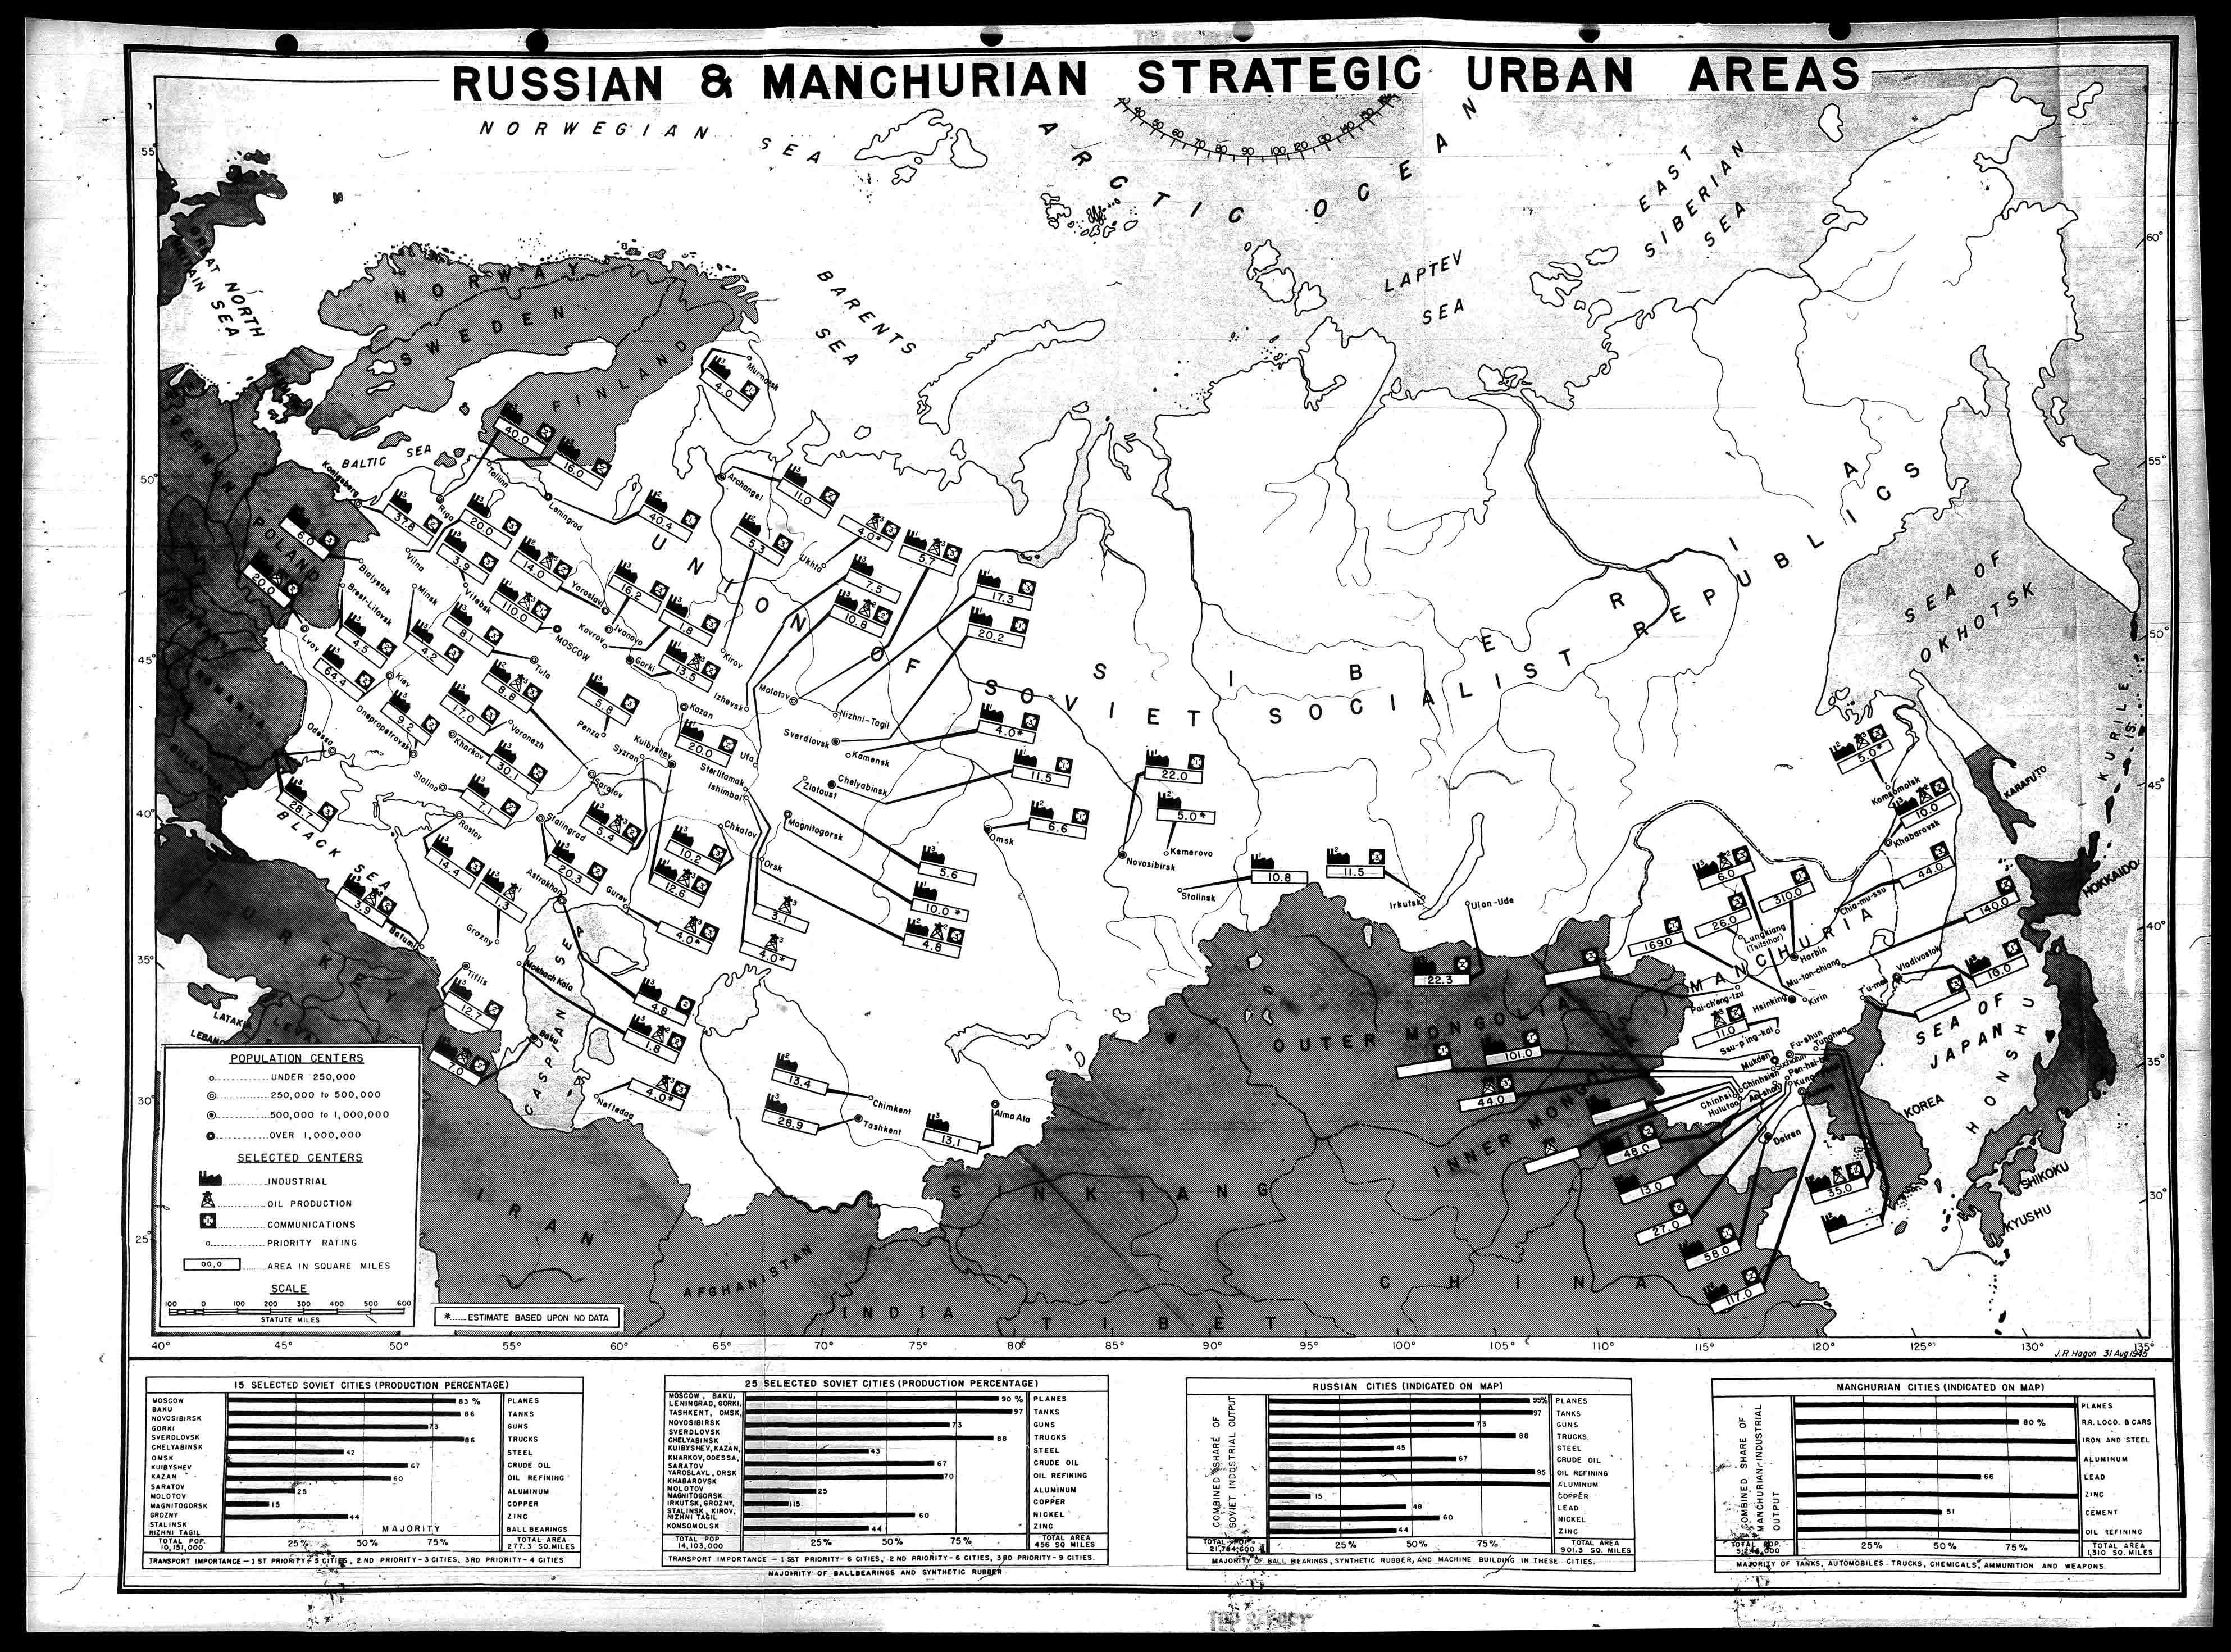 1945-russian-and-manchurian-strategic-urban-areas.jpg